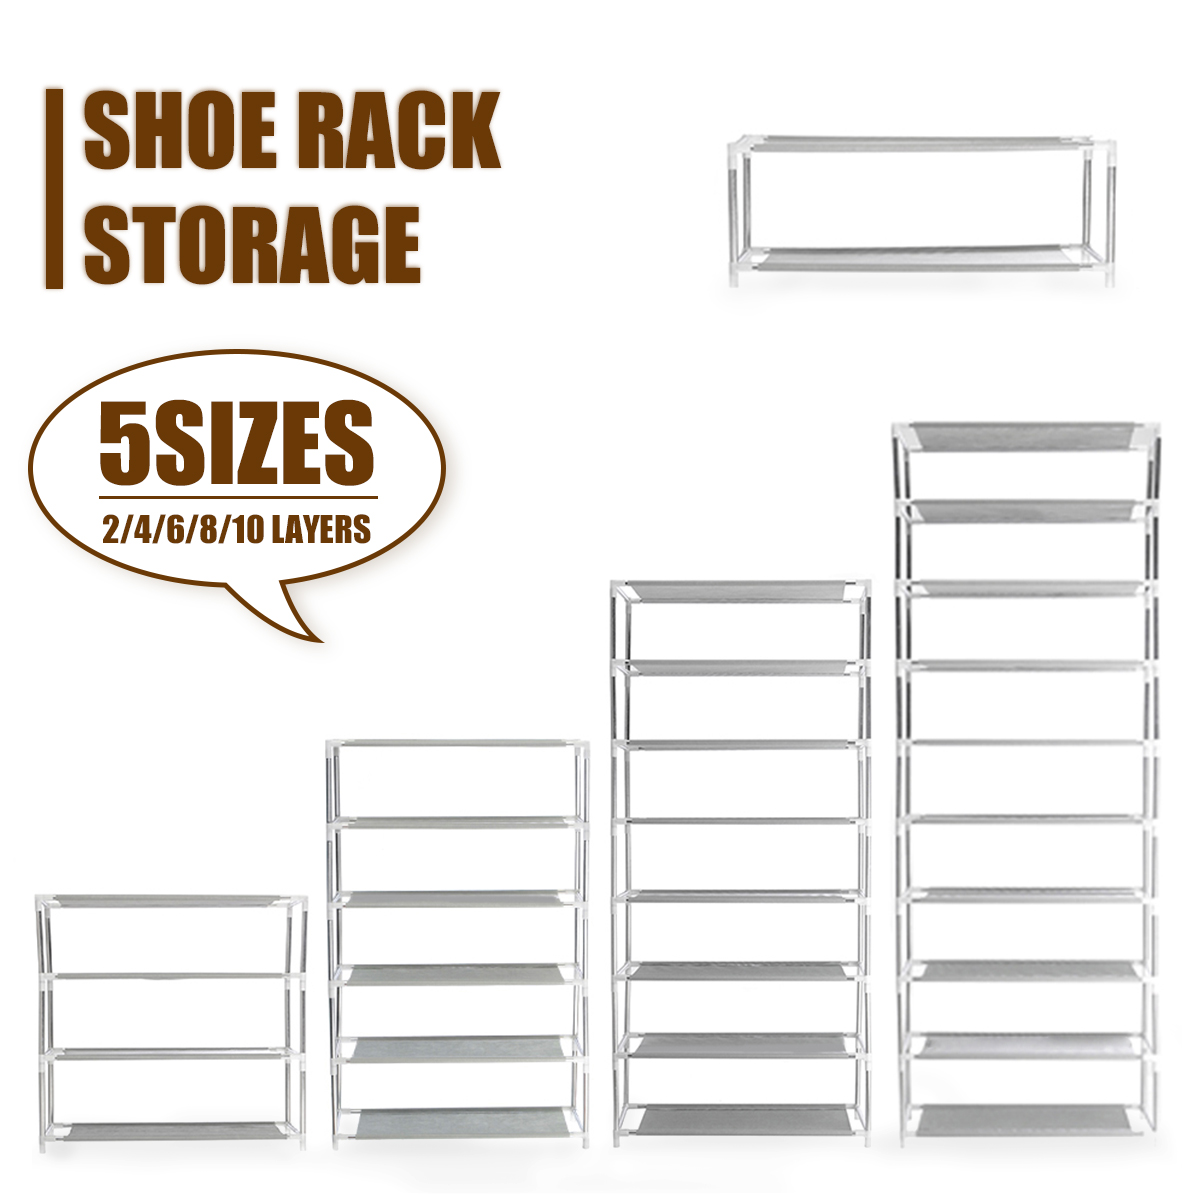 Multi Layer Tier Optional Metal Shoe Rack Storage Organizer Stand Shelf Holder 2/4/6/8/10 Tier Portable Shoes Display Storage цена